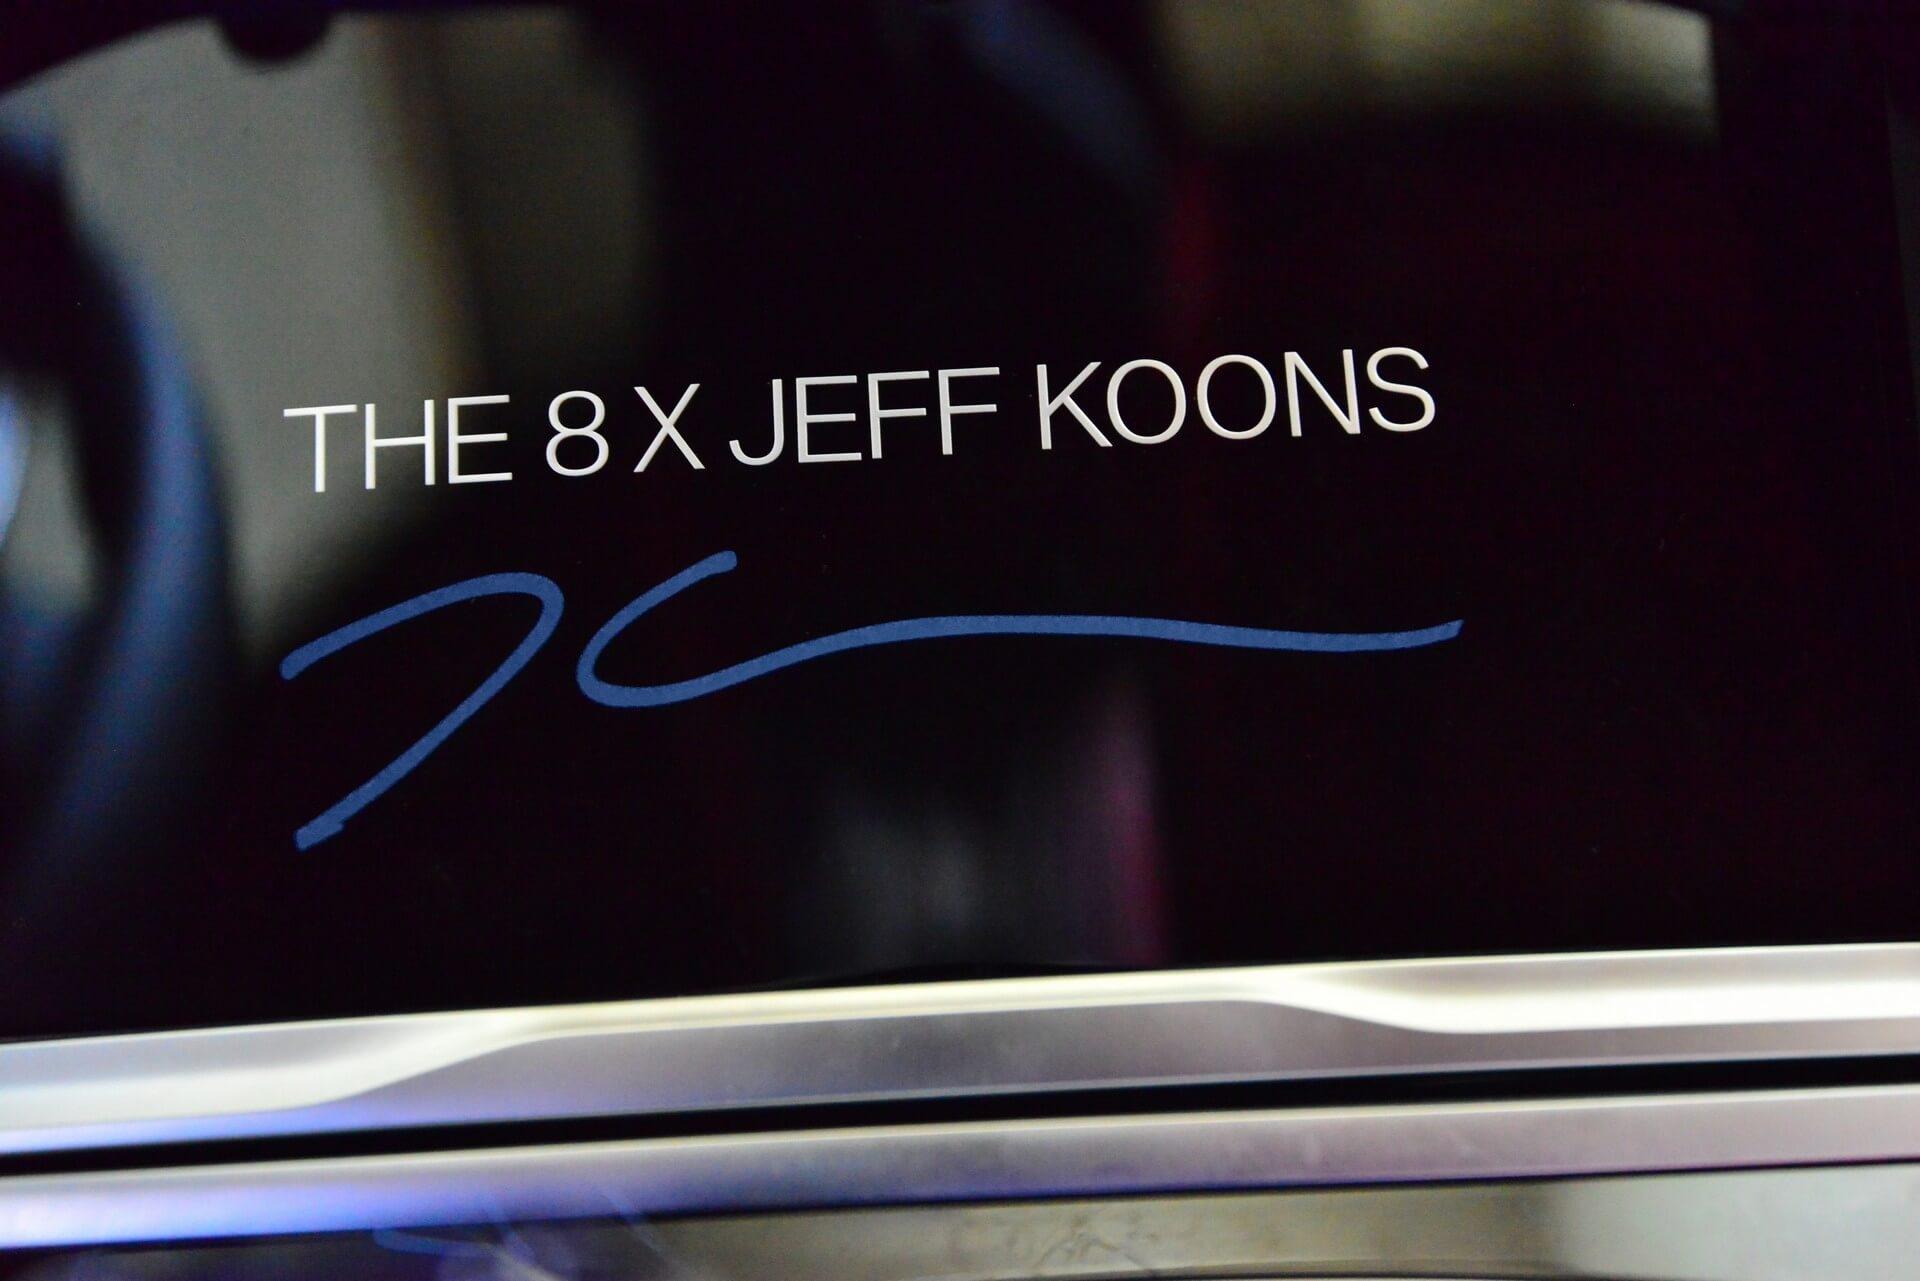 2022 BMW 8 x Jeff Koons 3